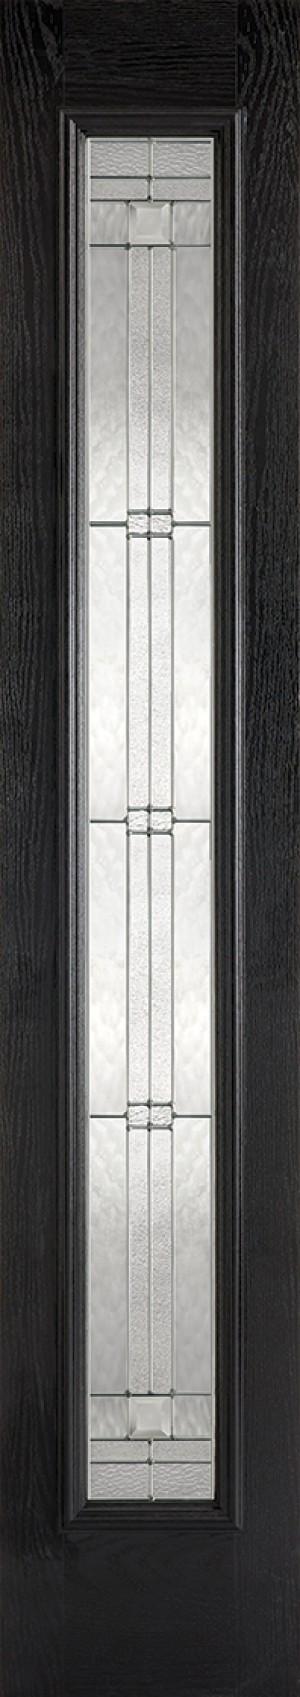 "LPD - External Door - GRP Sidelight Black Glazed 1L Elegant 2032 x 356 (14"")  GRPBLASLELE"